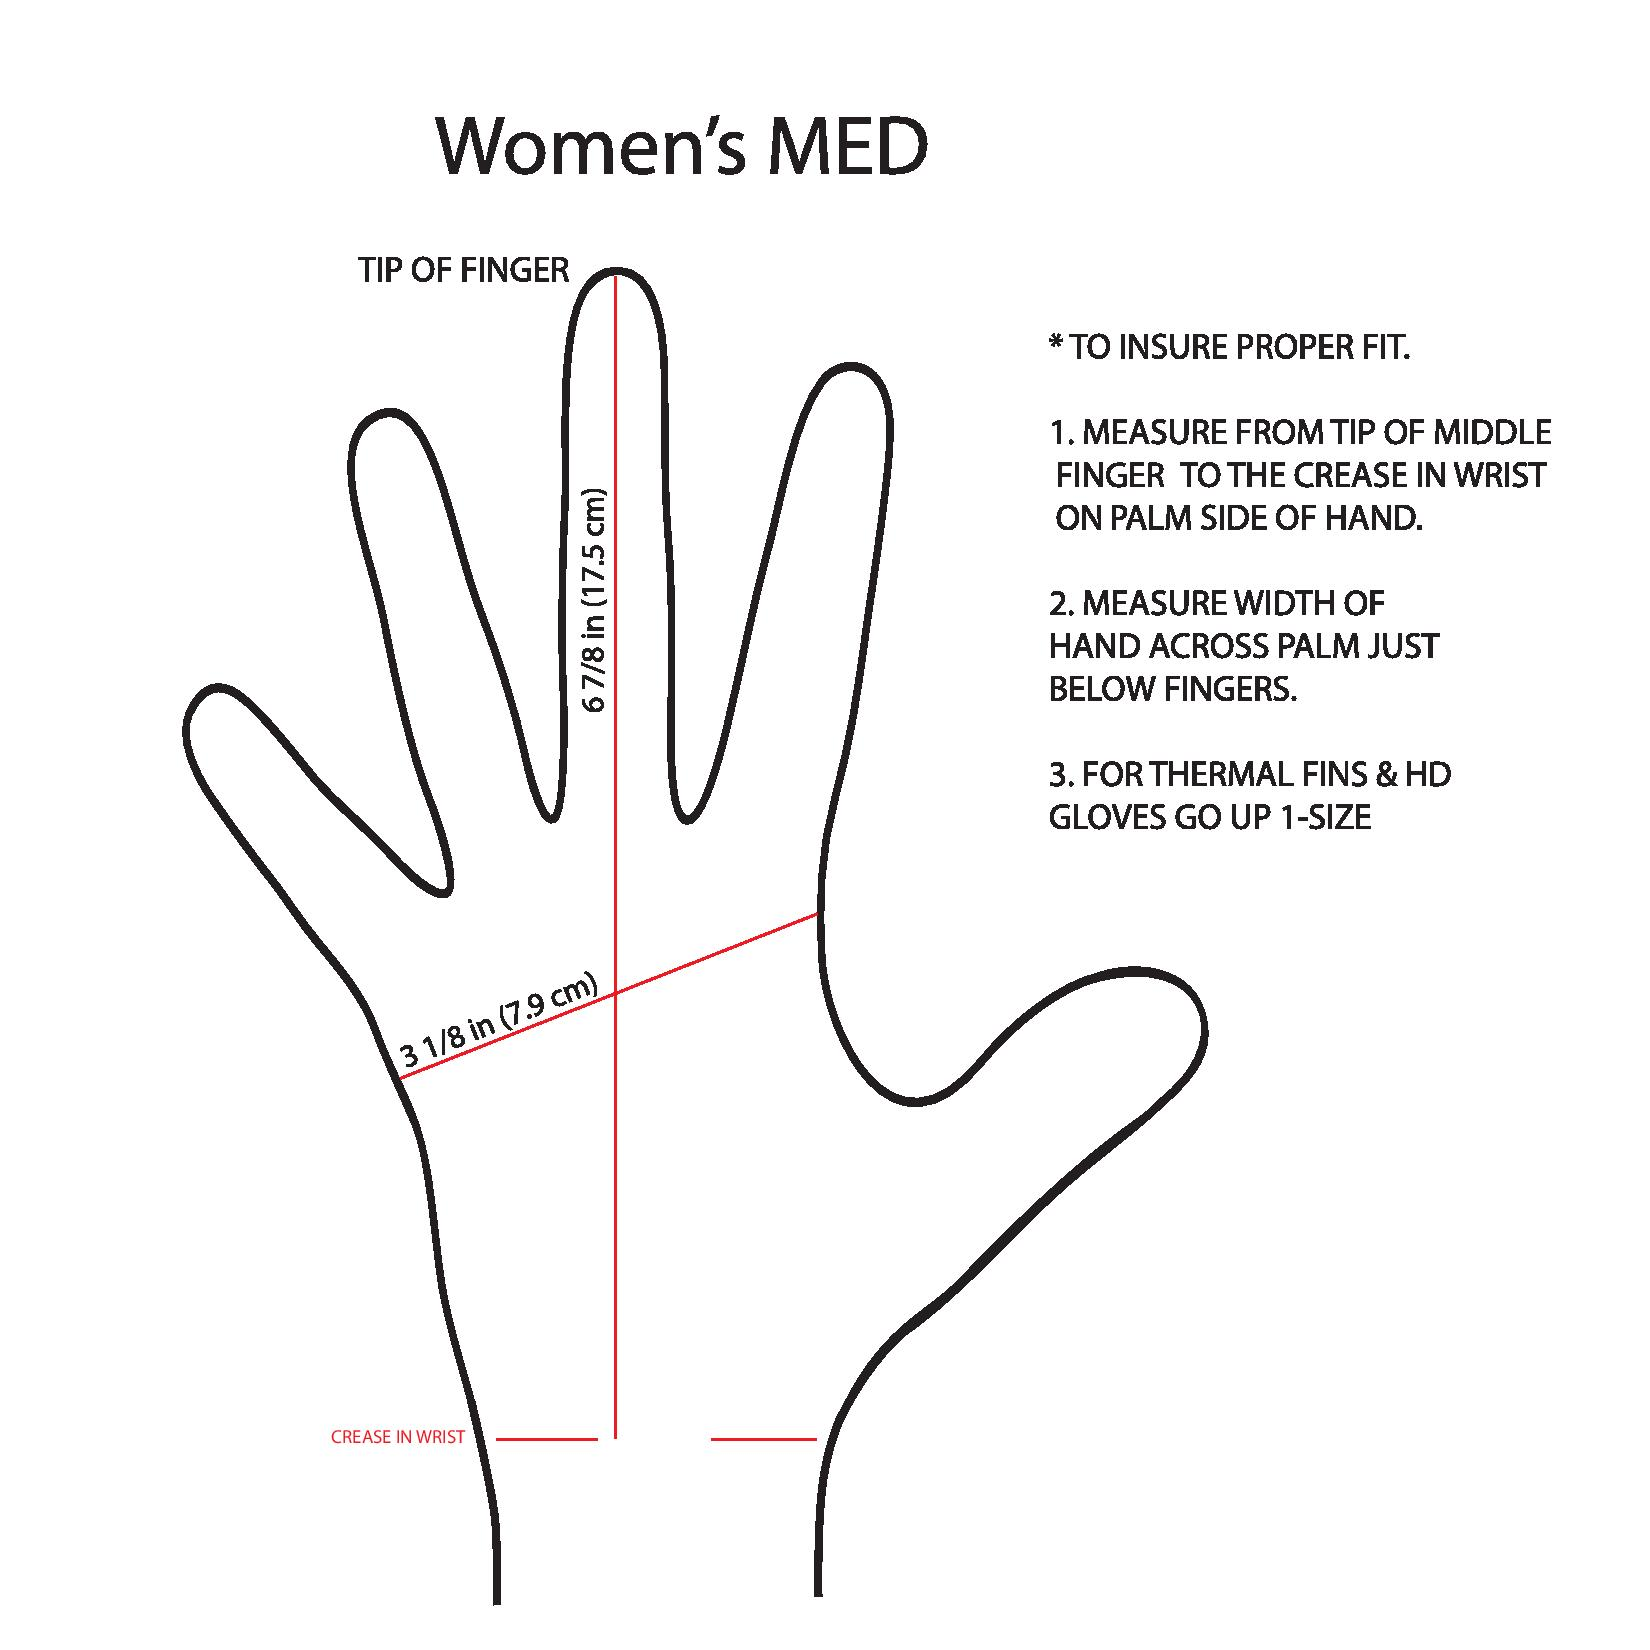 women-s-med-page-001-2-.jpg